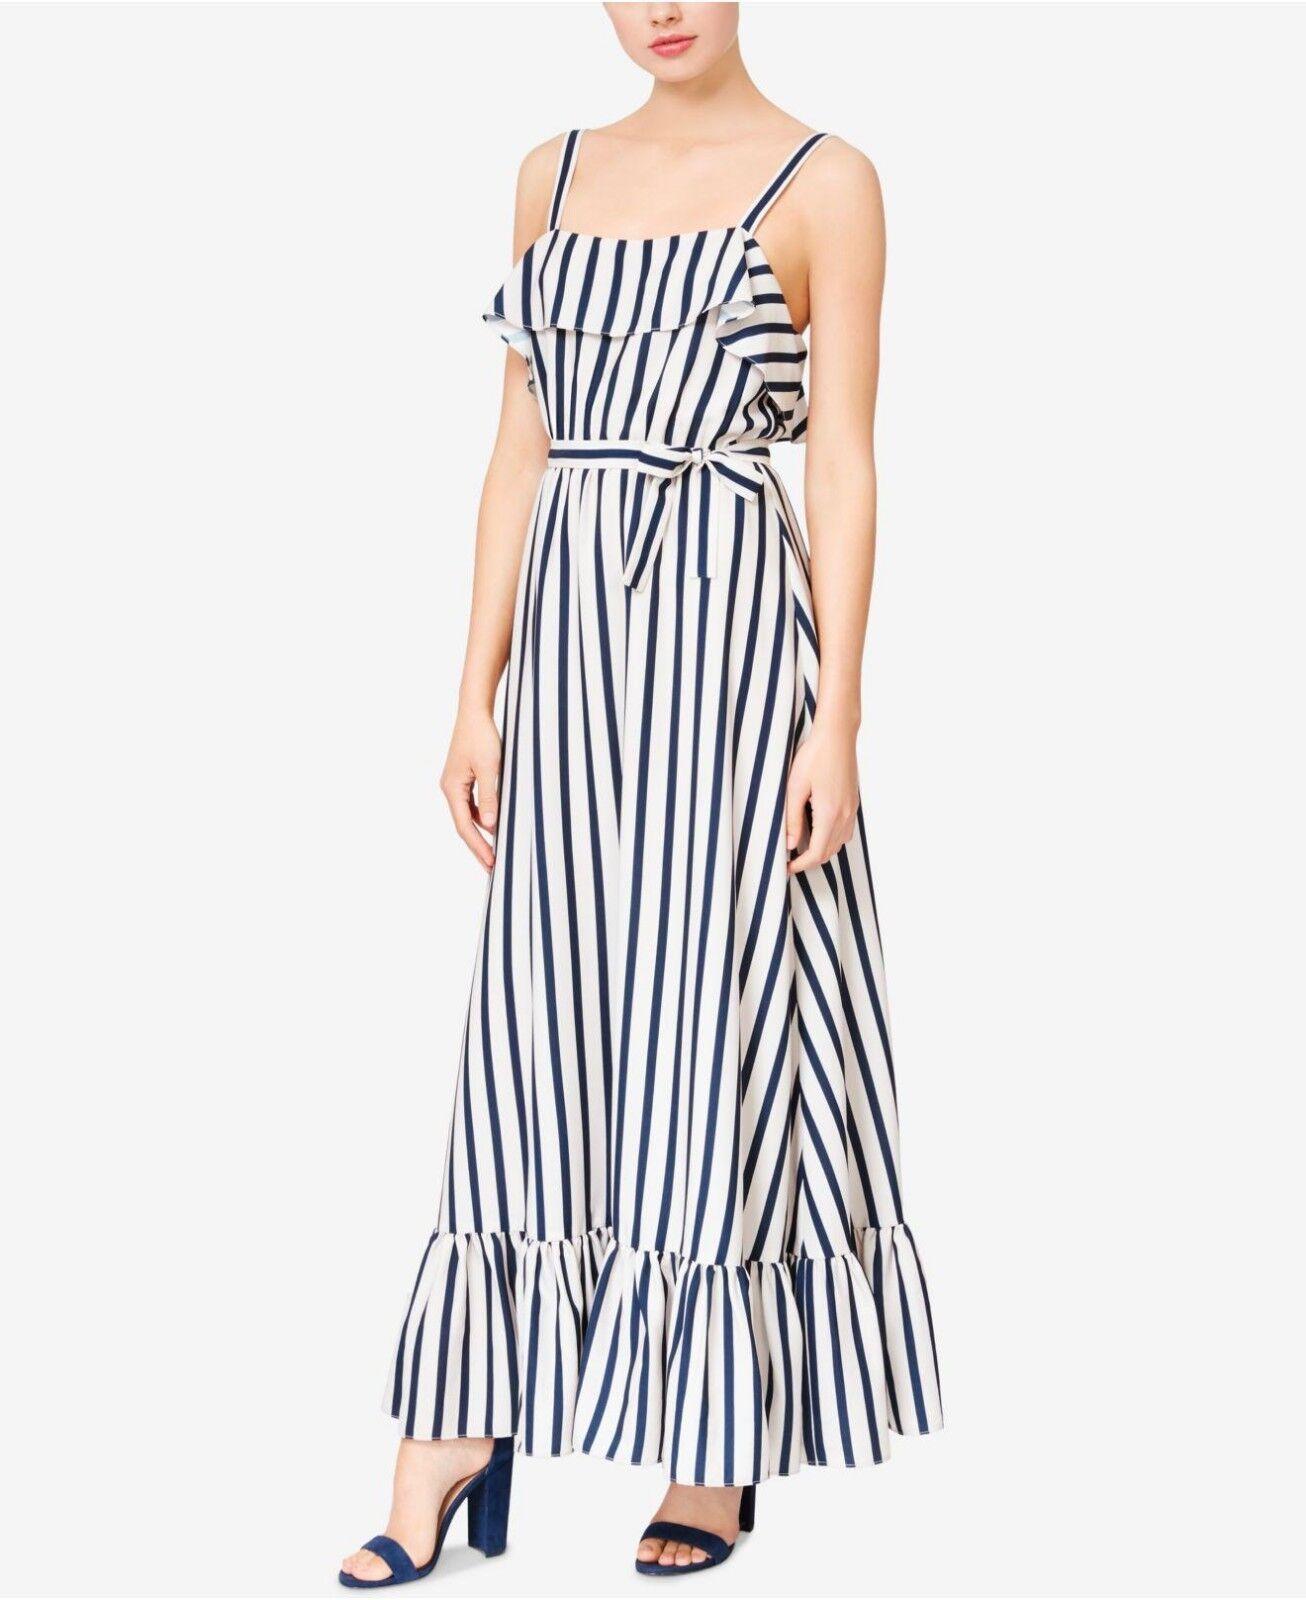 NWT  - BETSEY JOHNSON Striped Ruffle Hem Maxi Dress, Cream   Navy, Größe 8